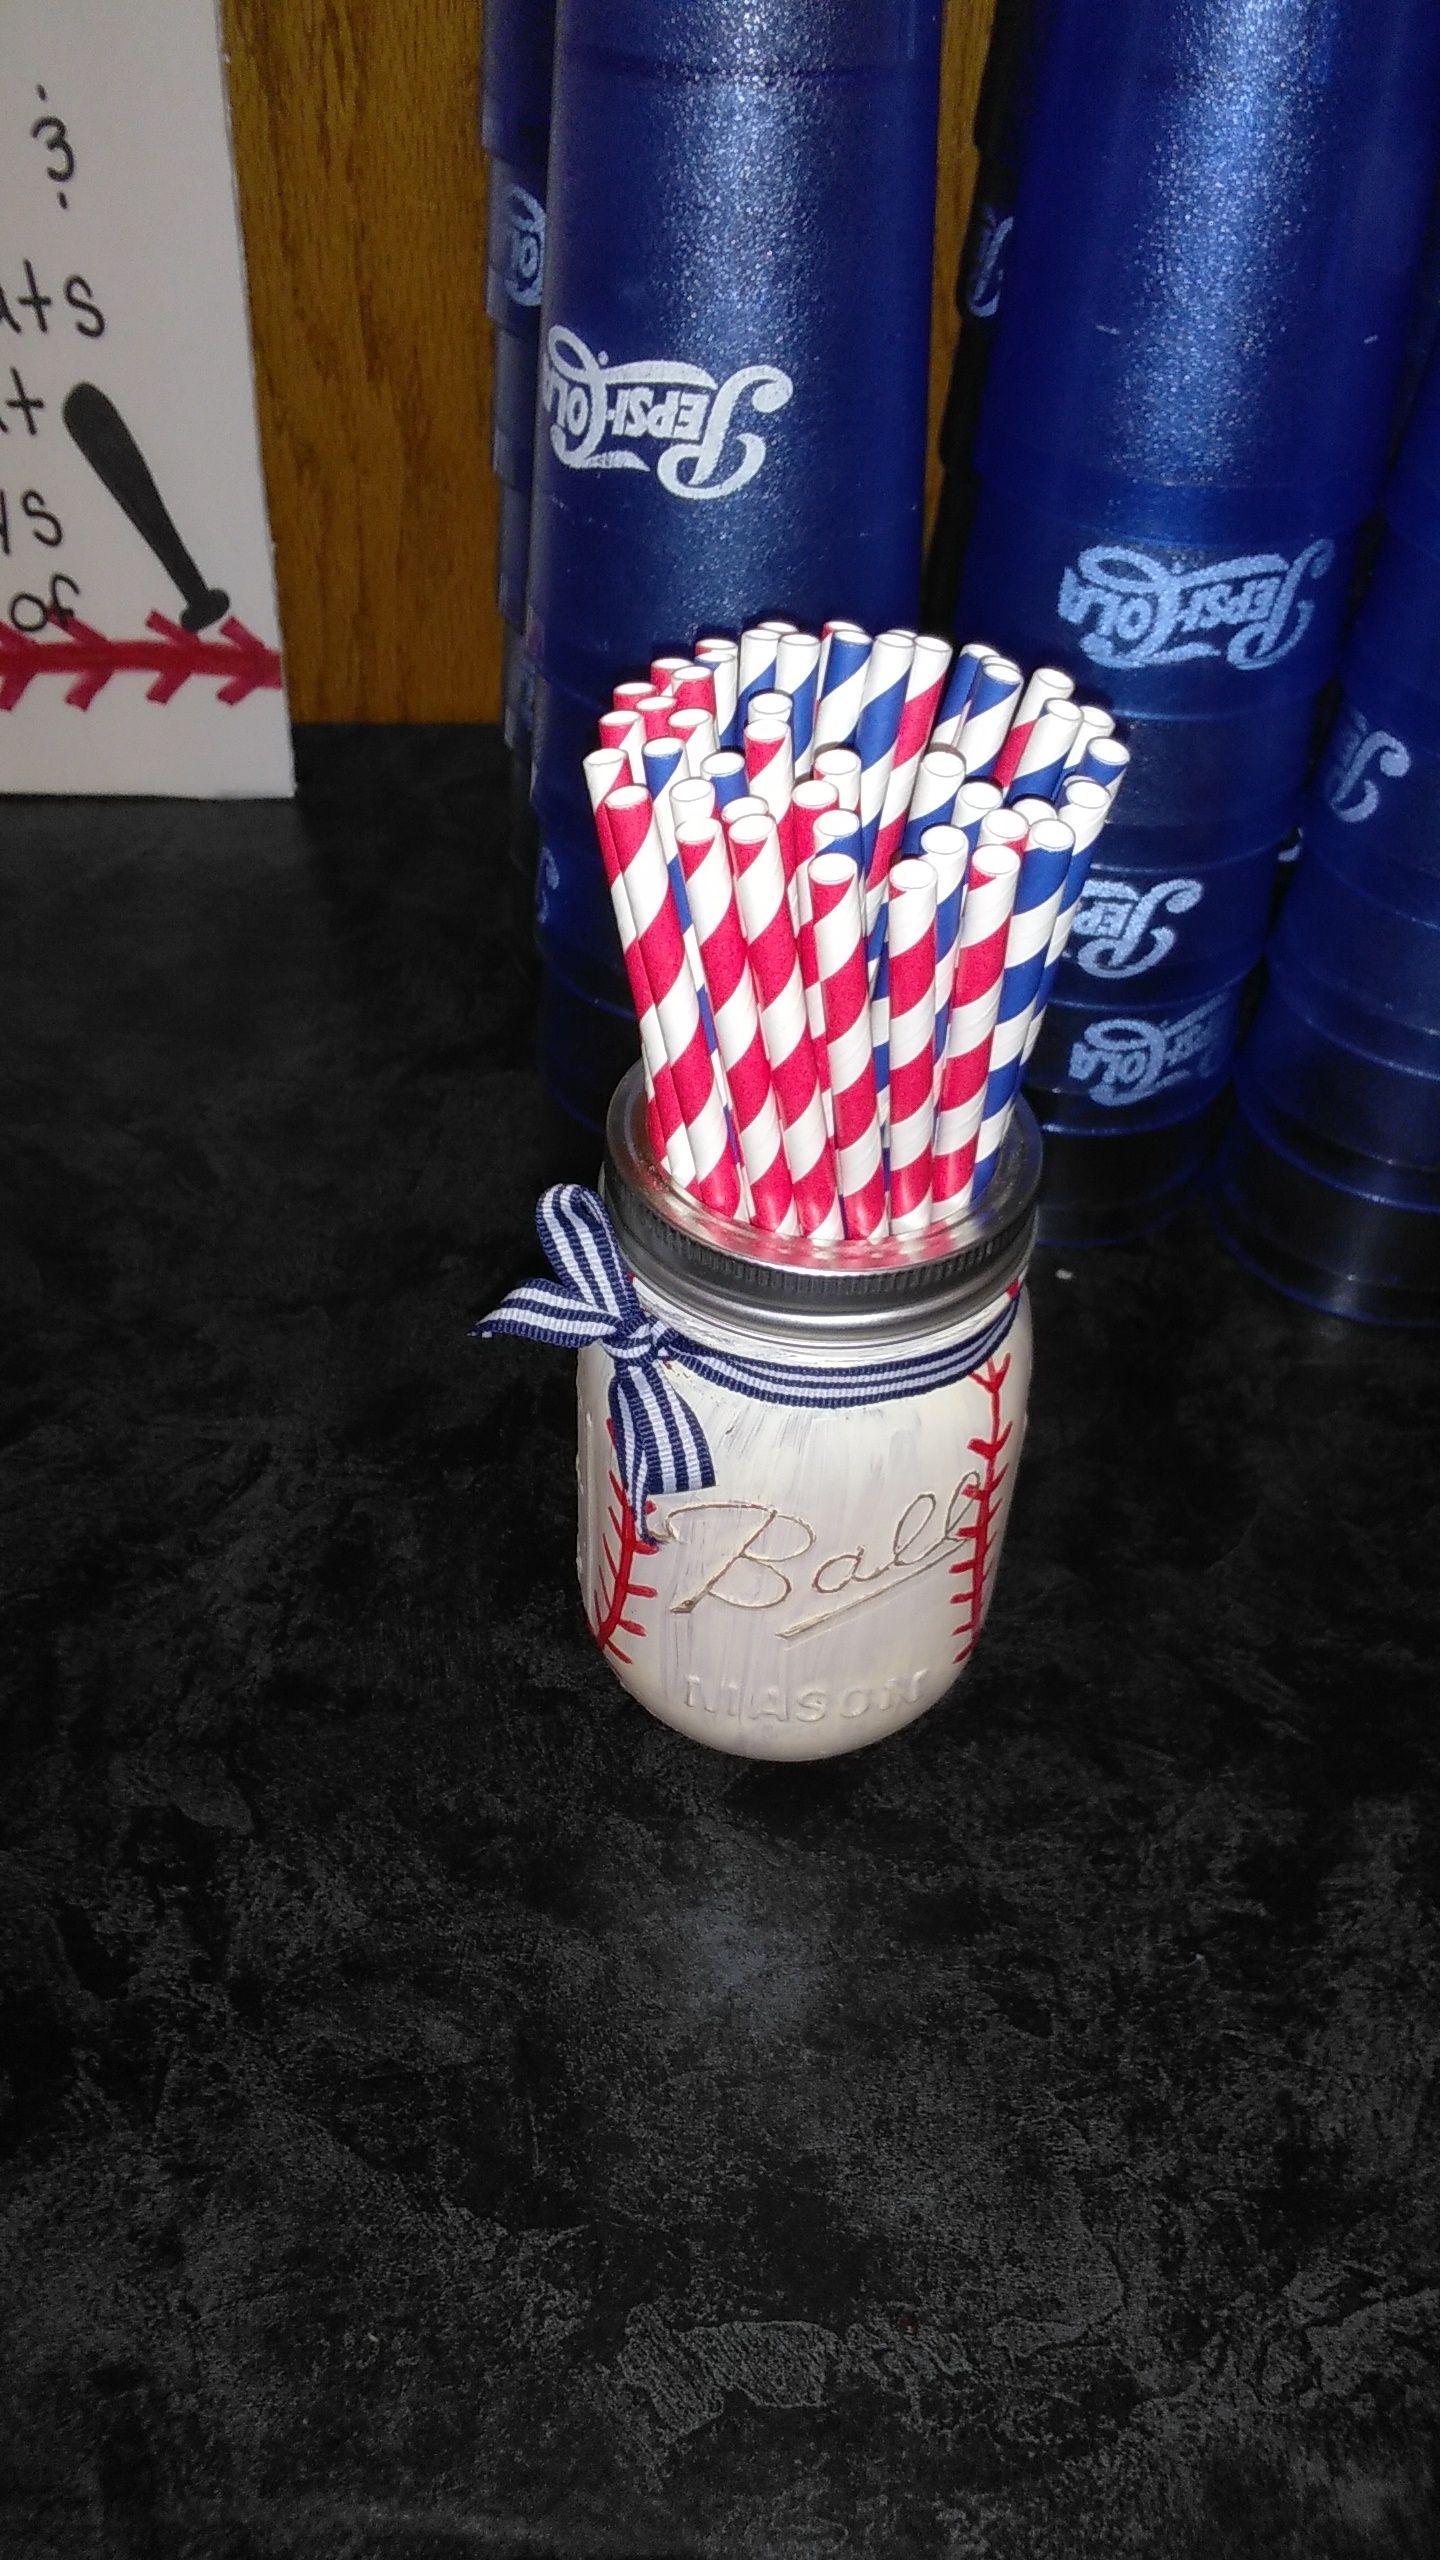 Mason ball jar painted to look like a baseball later put handprint